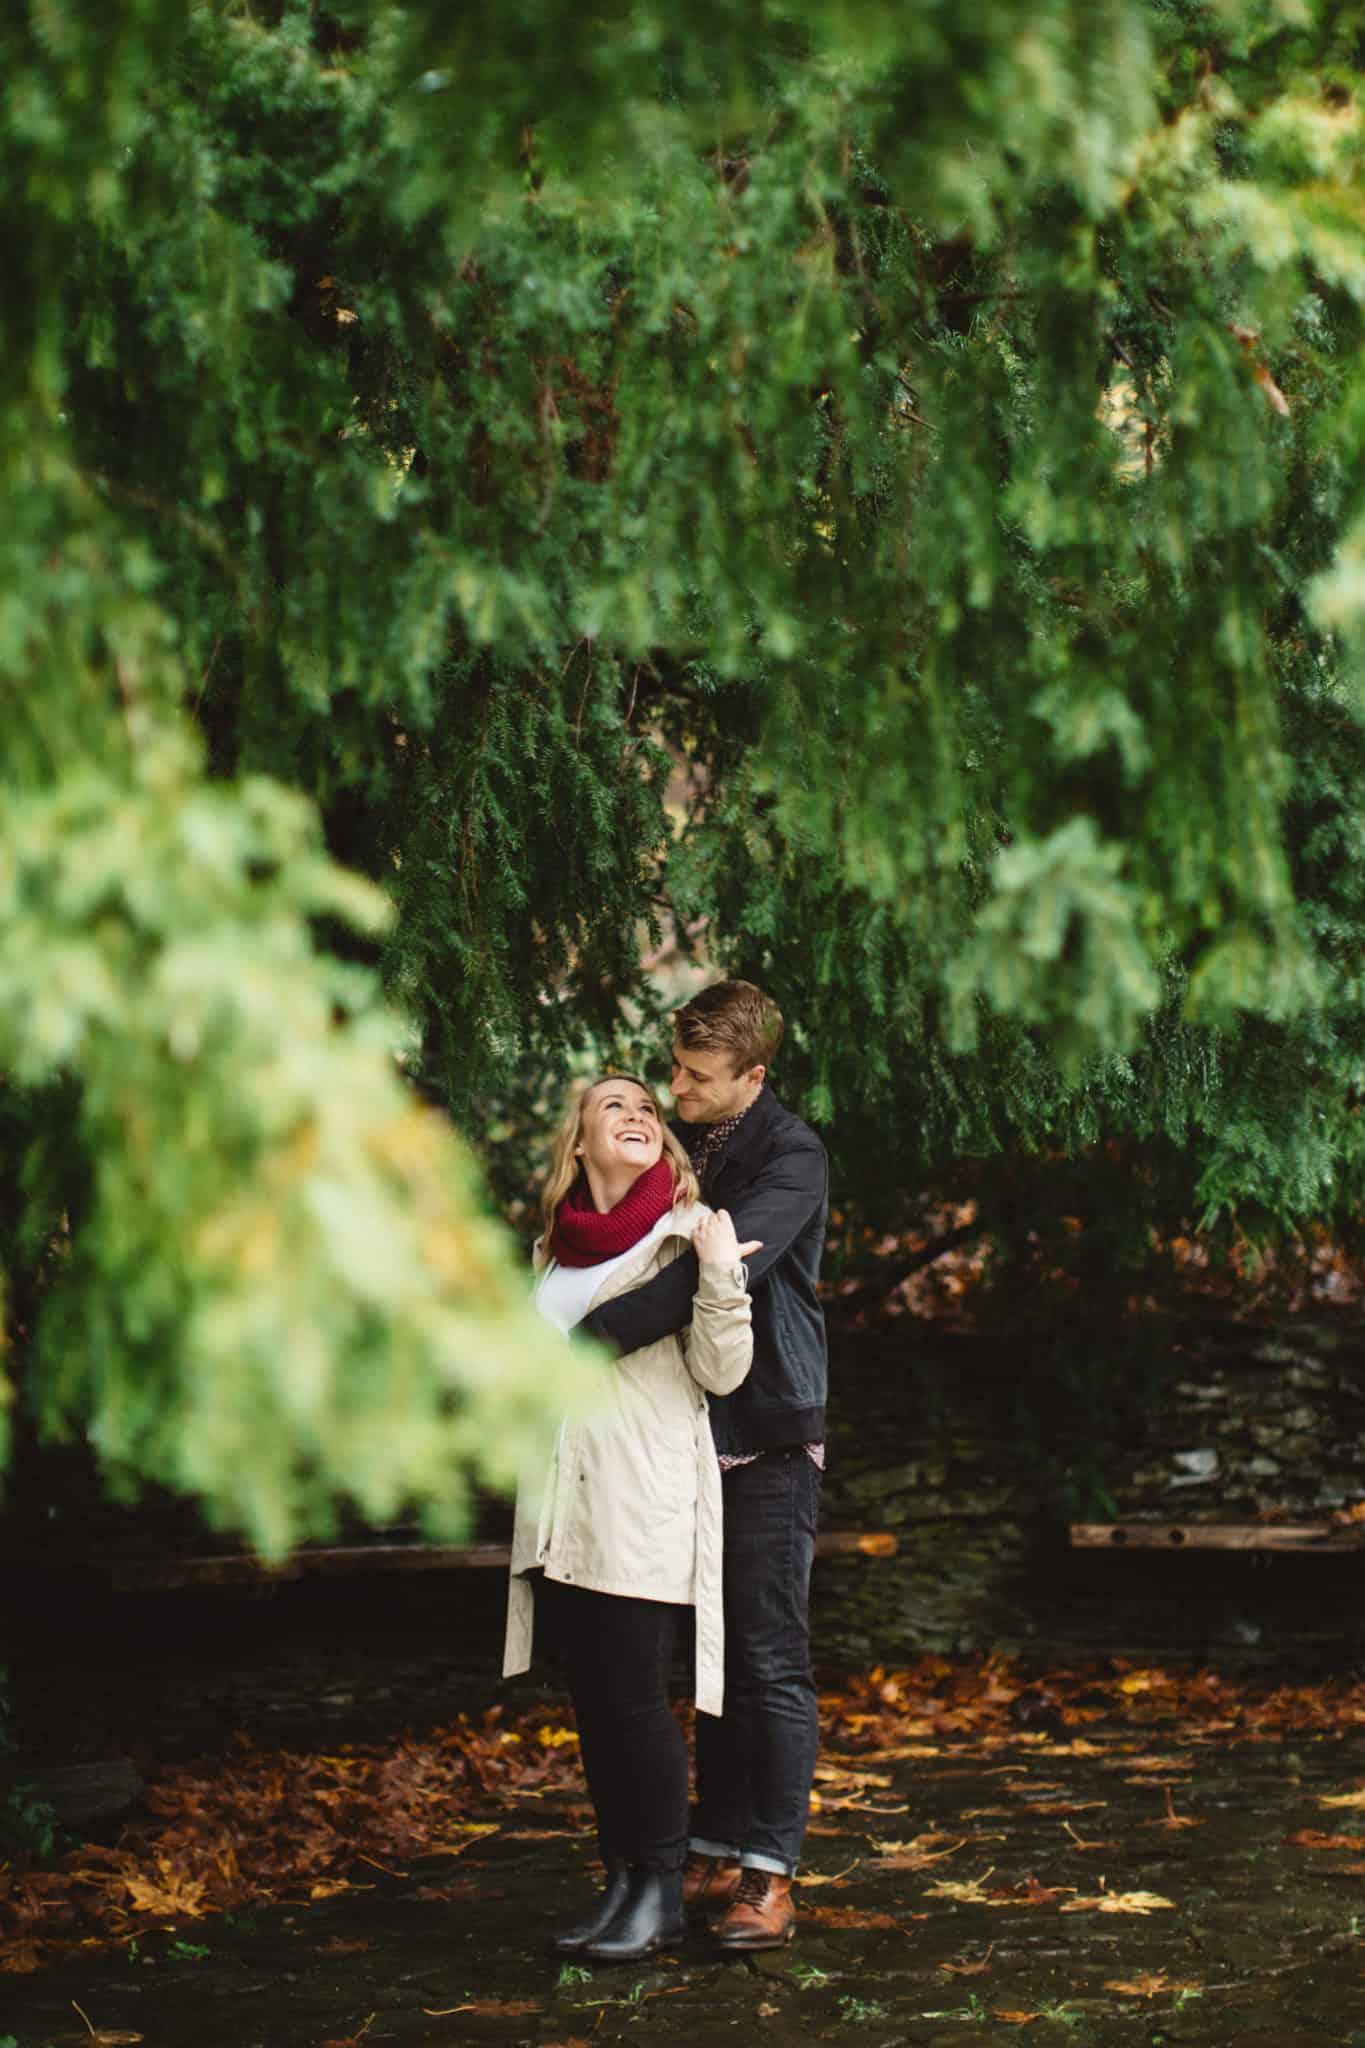 Washington Park Arboretum, Seattle - PNW Engagement shoot locations - TheMandagies.com